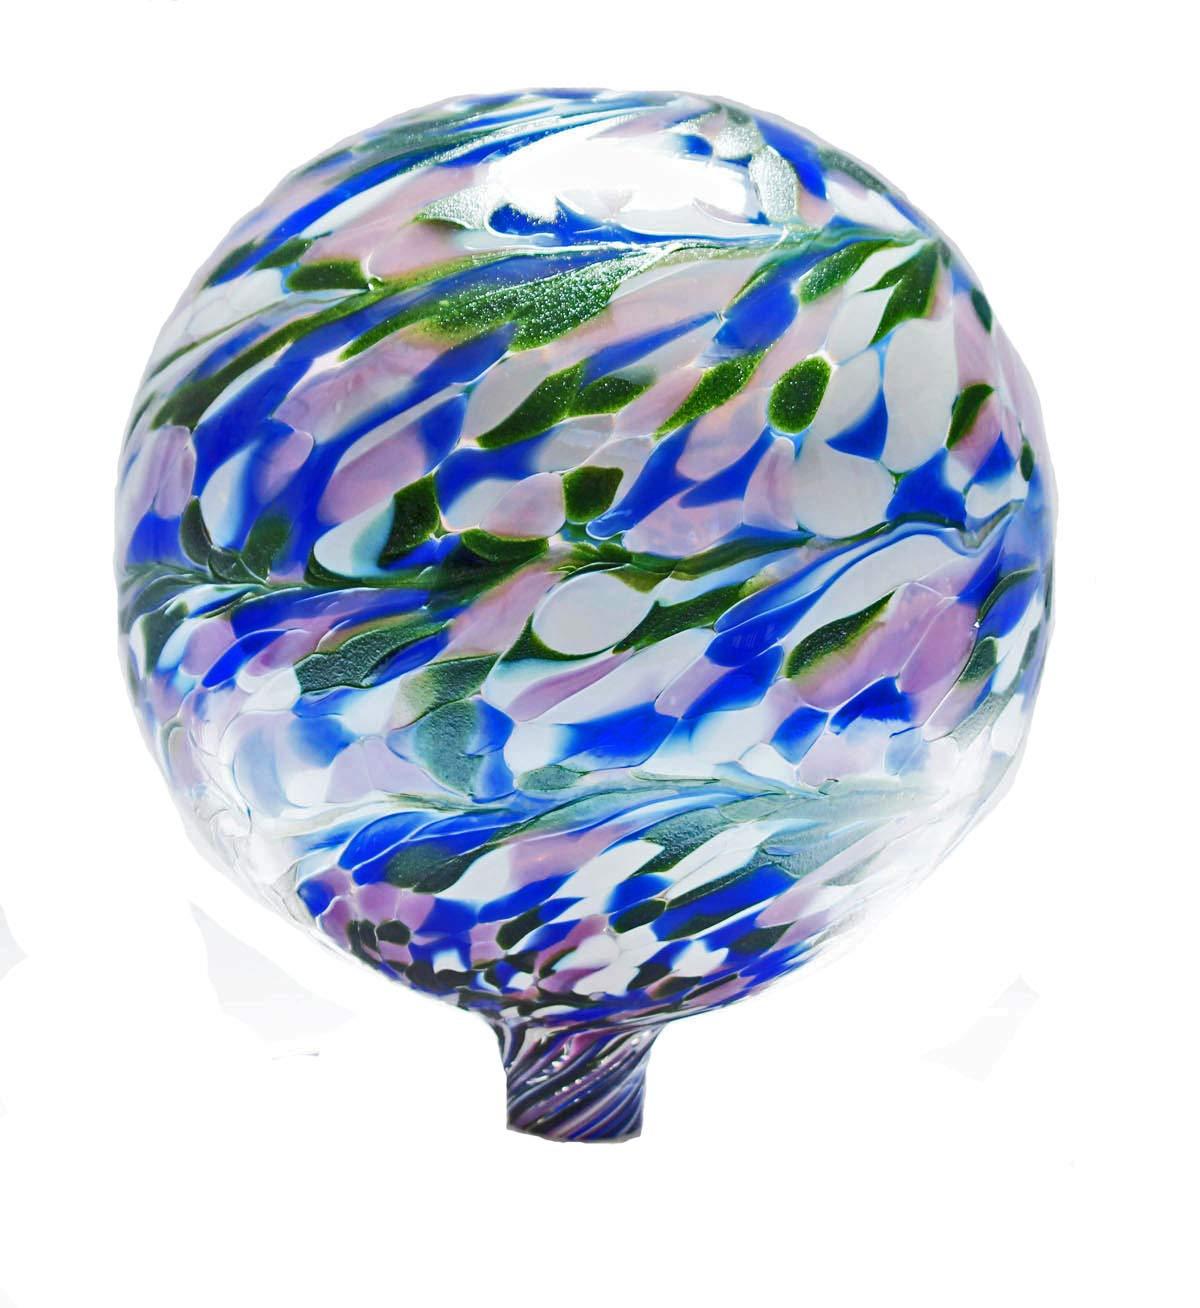 Glass Gazing Ball Garden View II 12 Inch by Iron Art Glass Designs